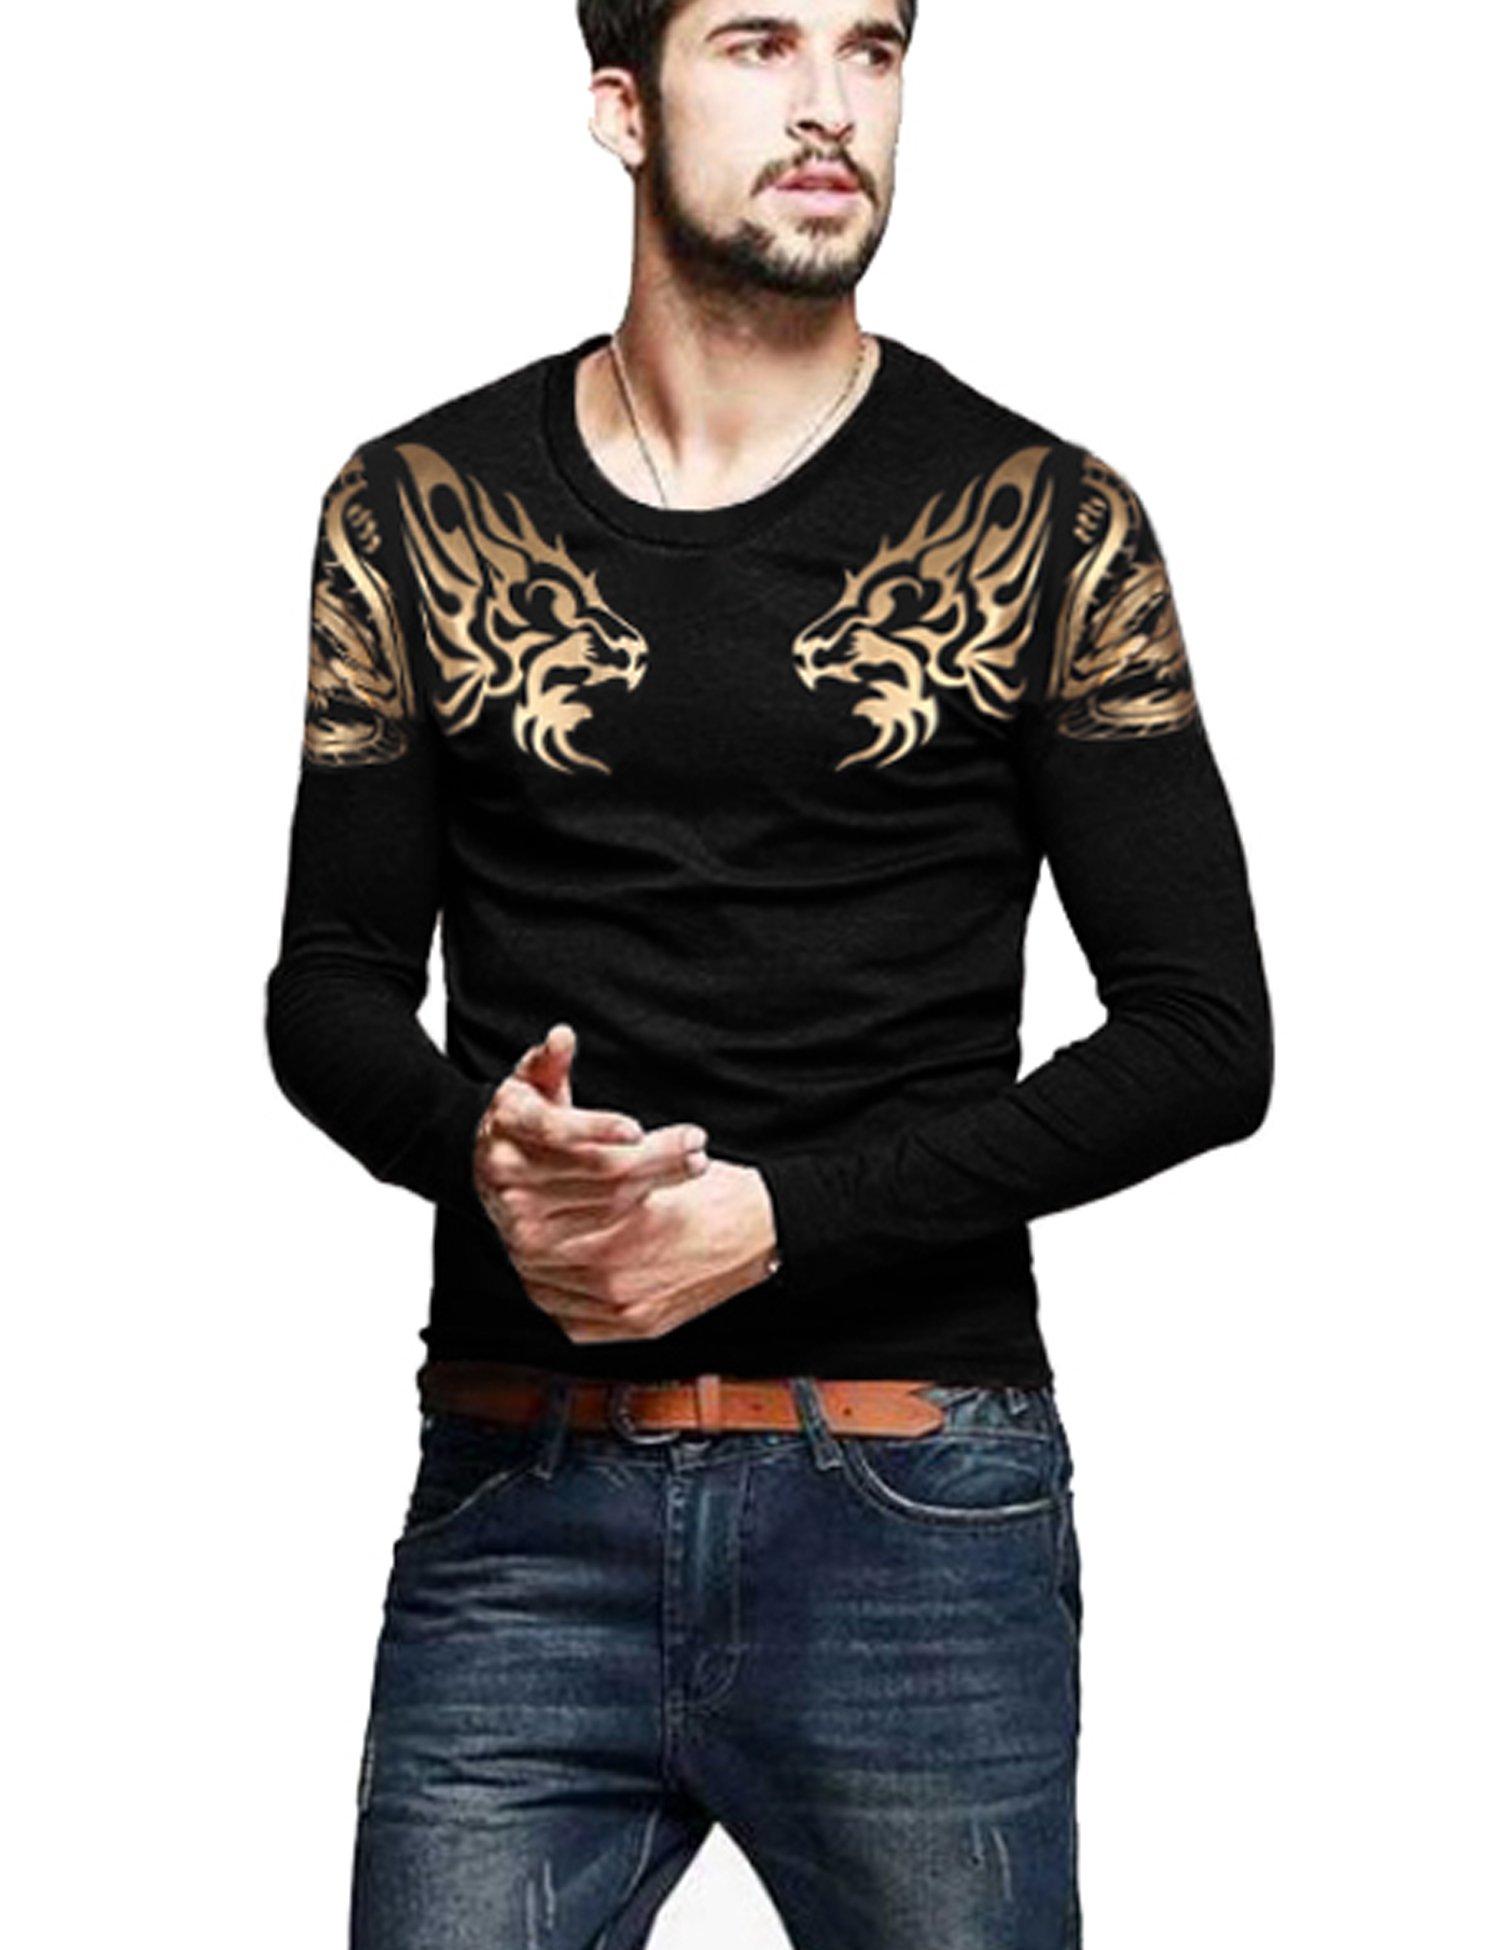 COOFANDY Mens Print Tees Dragon Graphic Long Sleeves Fashion T-Shirts Black L by COOFANDY (Image #3)